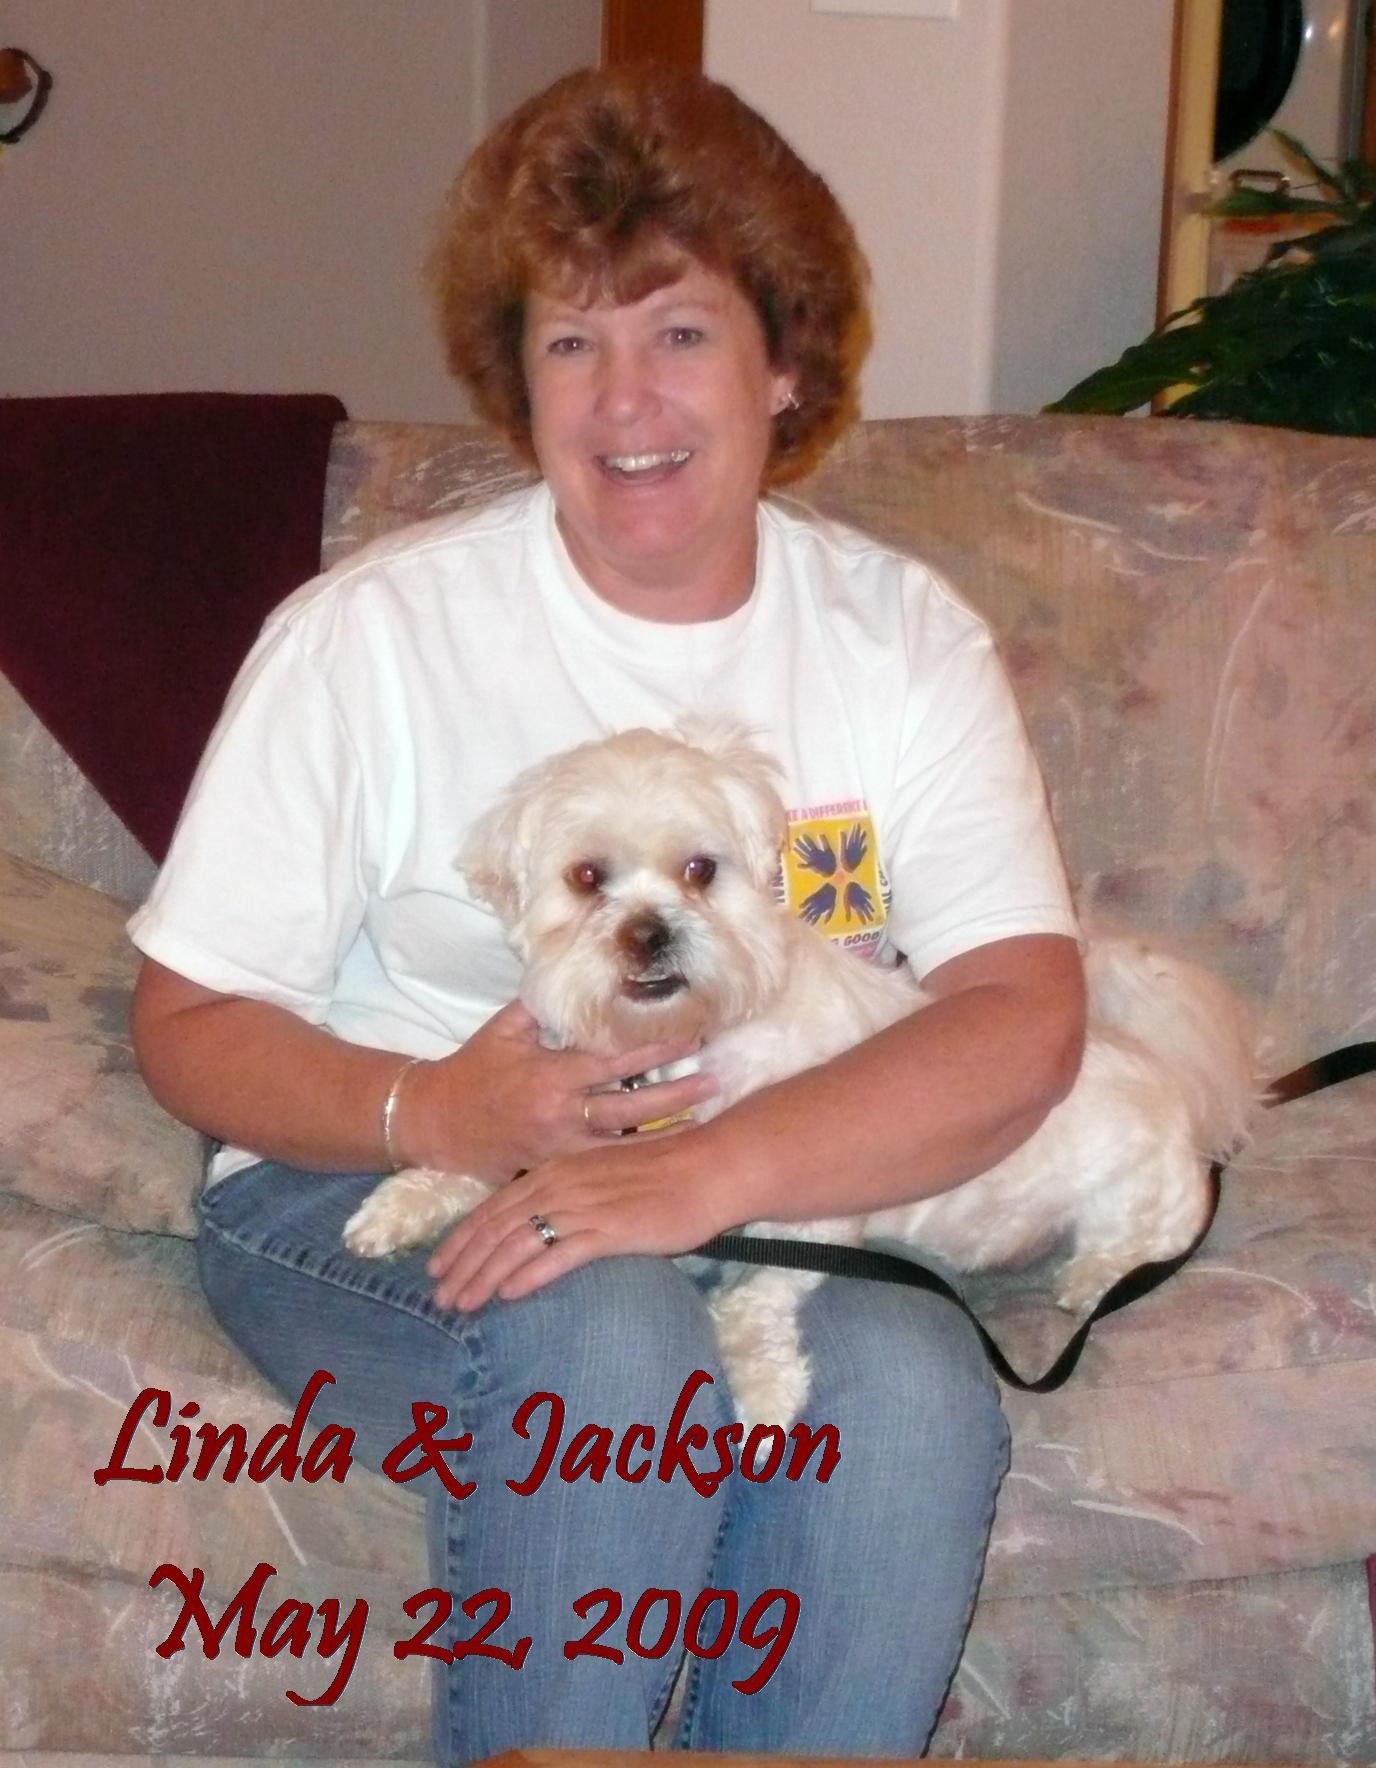 Linda & Jackson